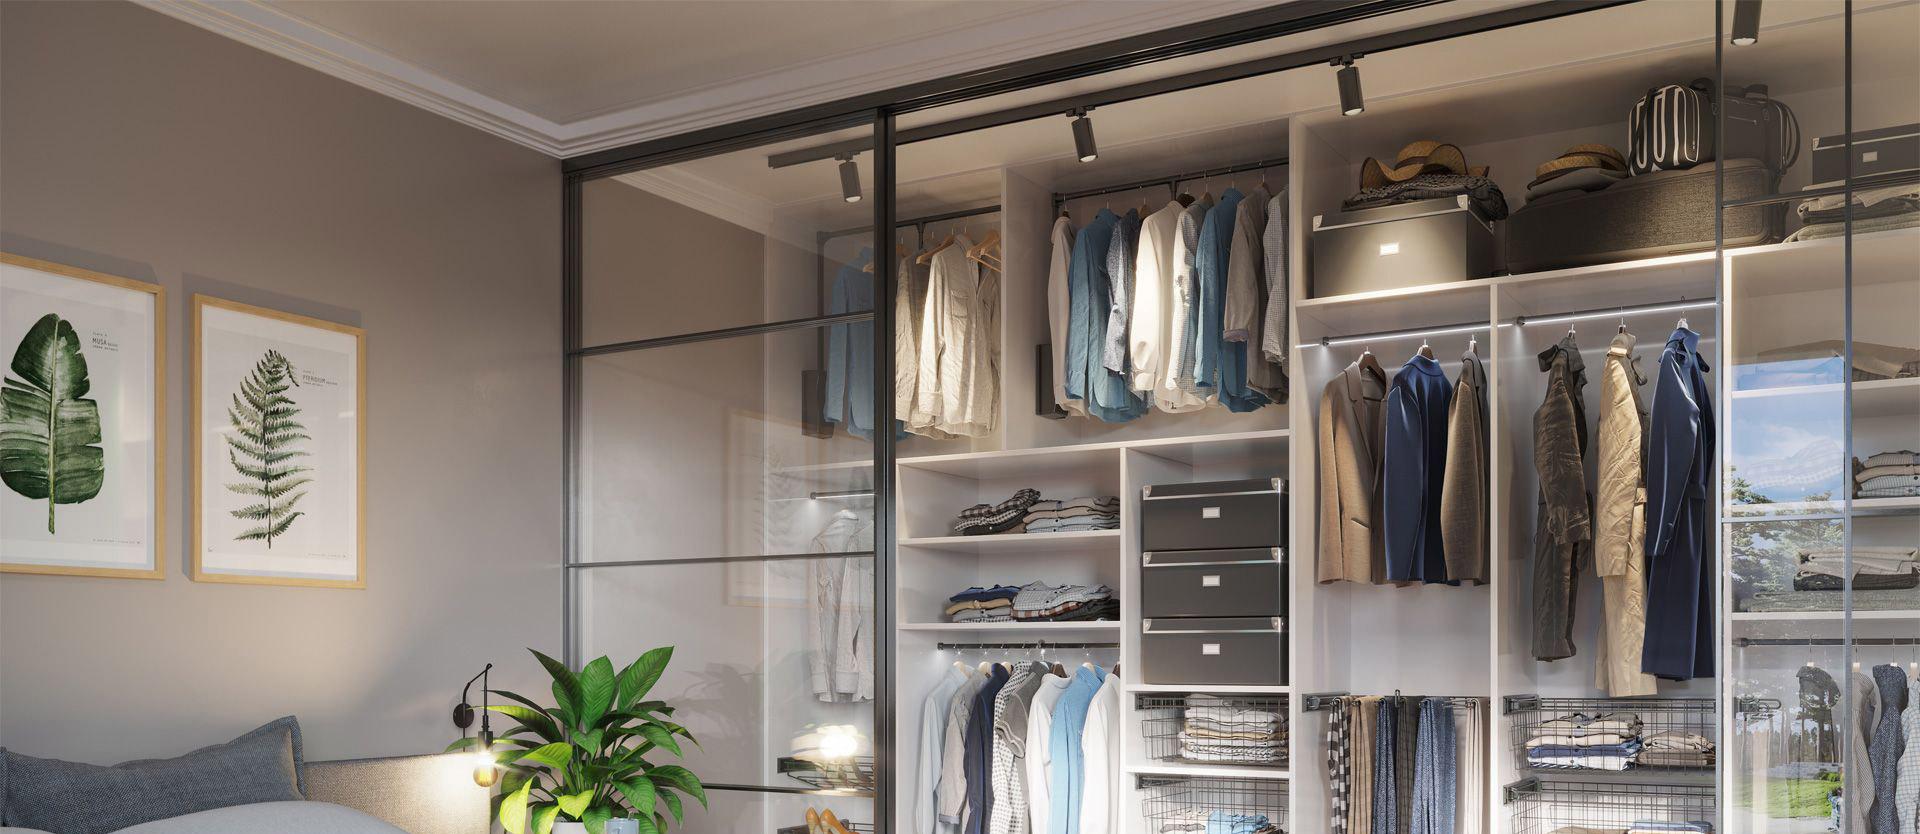 Garderoba smart antracyt 2